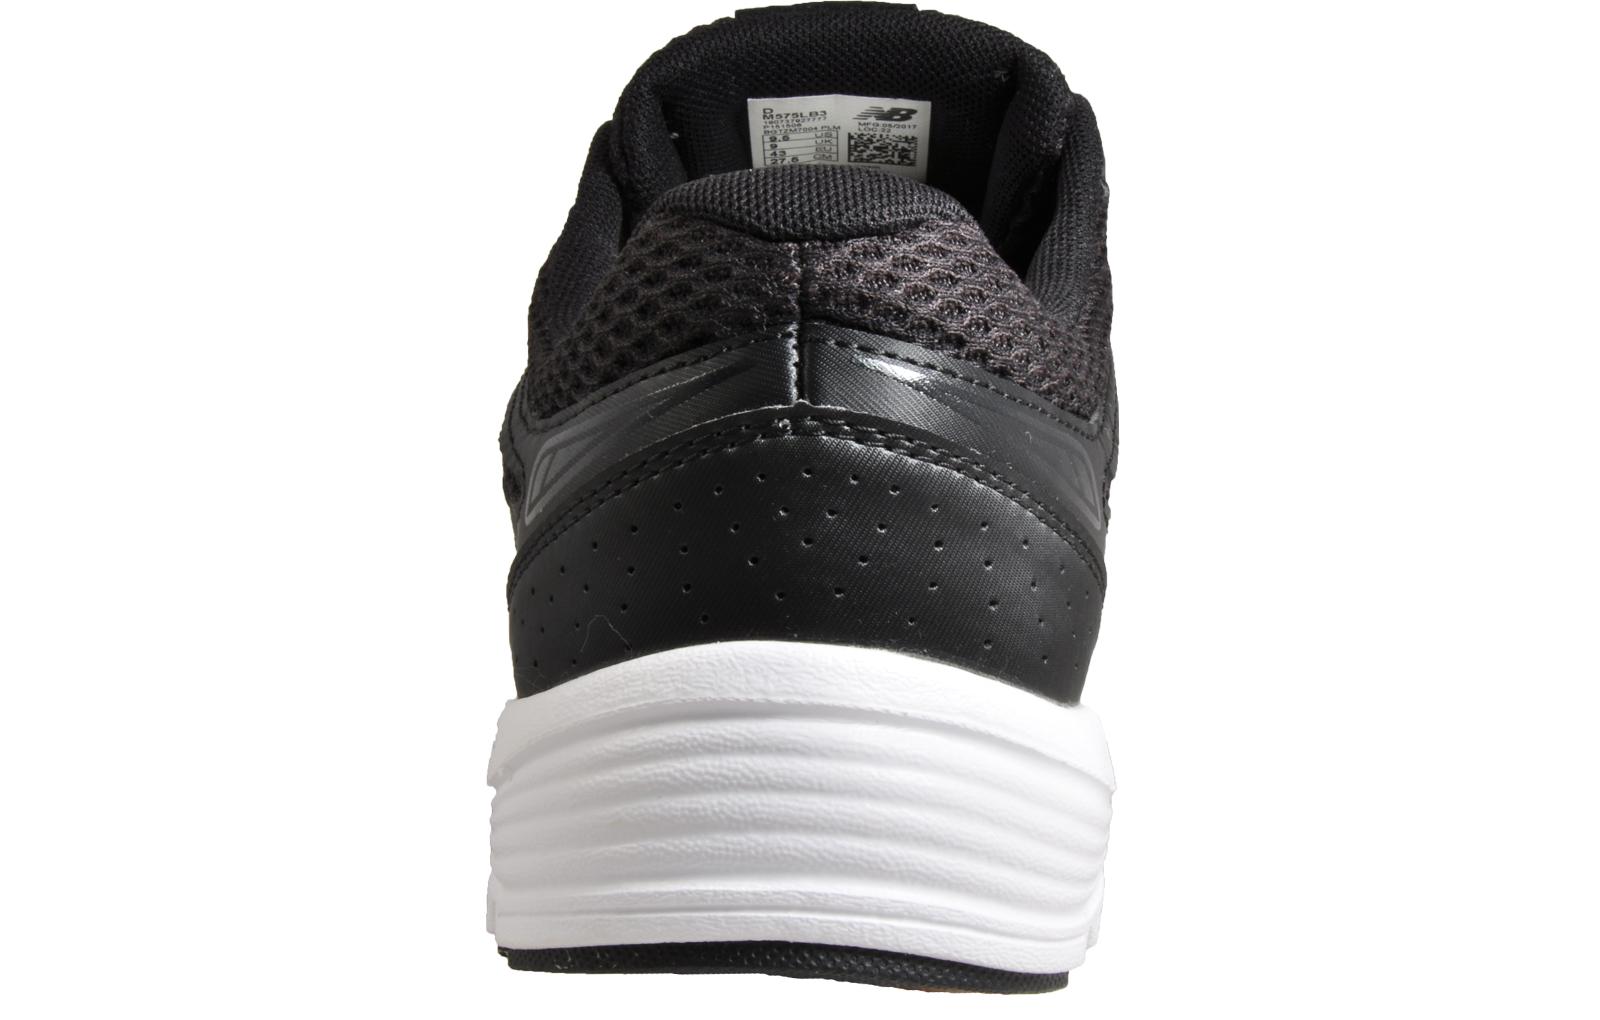 online store b868f a8202 New Balance 575 v3 Mens -